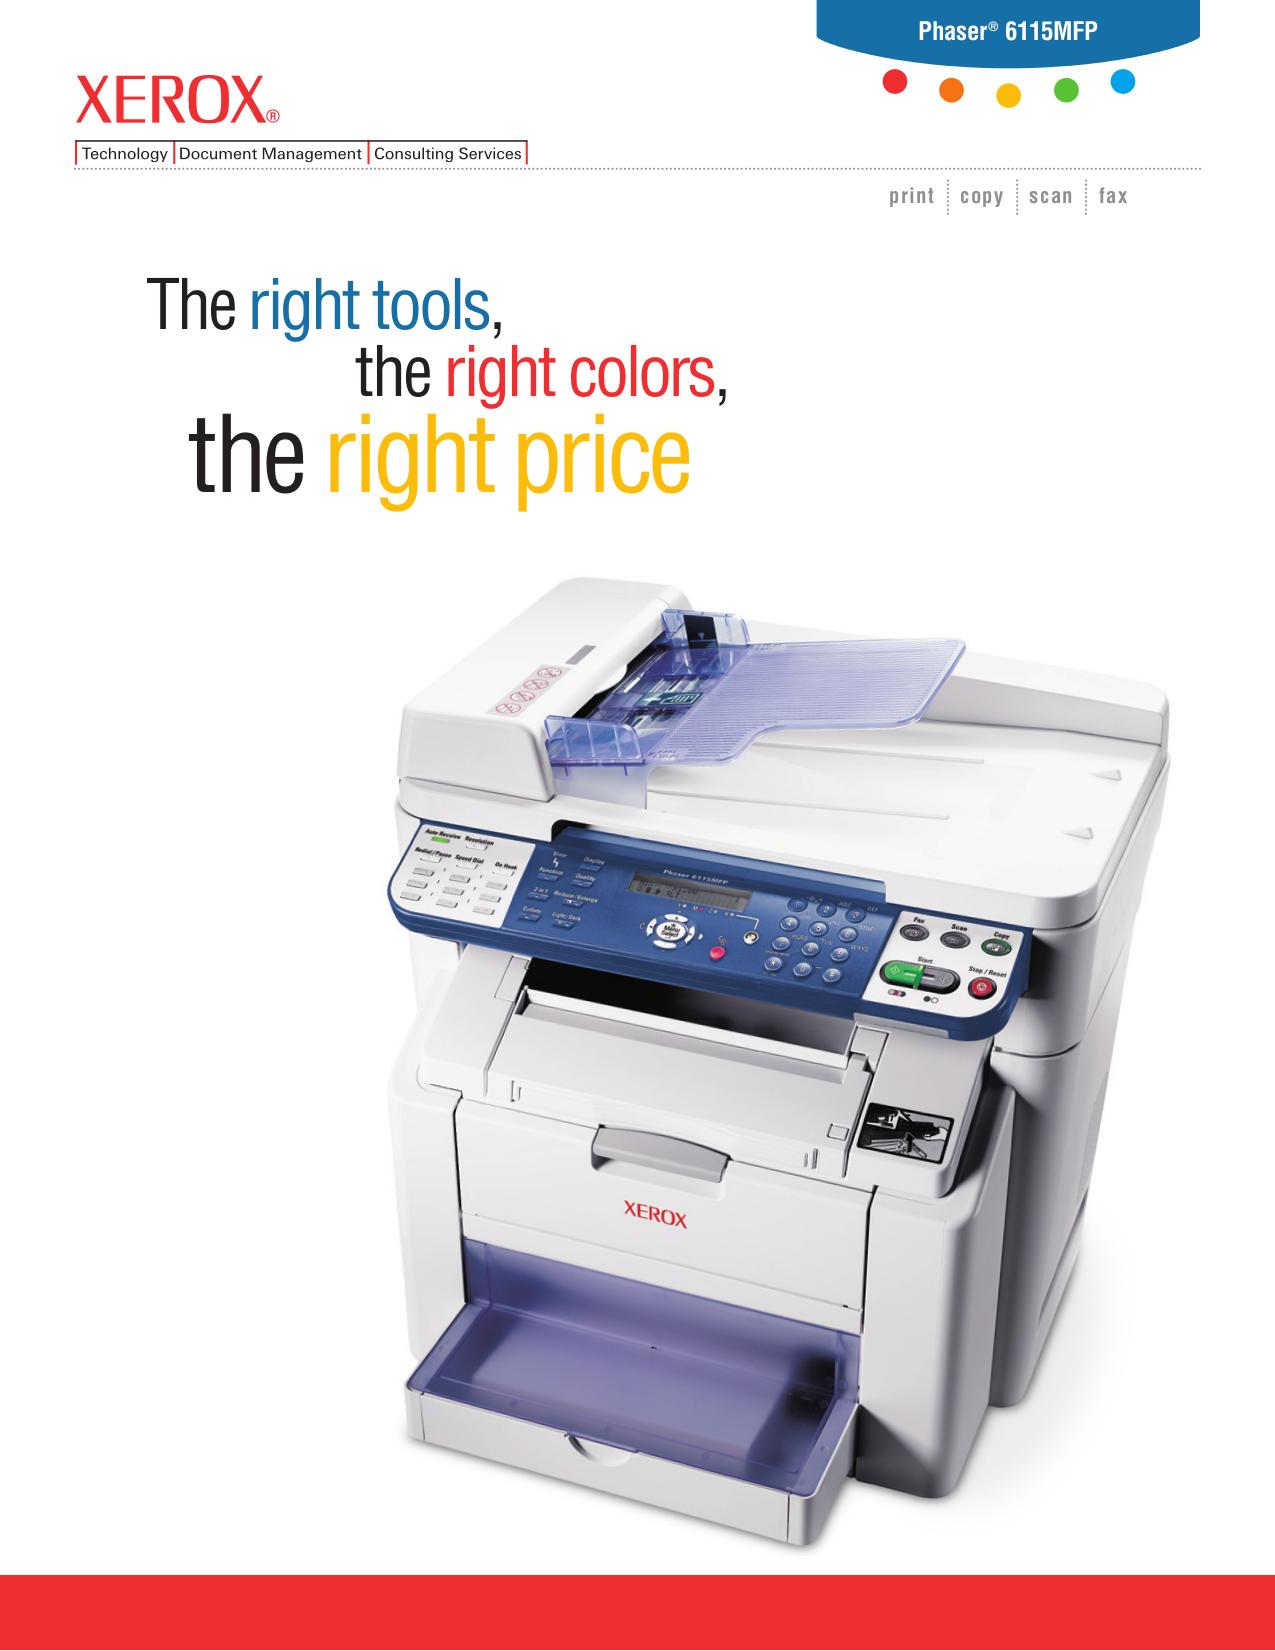 download free pdf for xerox phaser 6115mfp multifunction printer manual rh umlib com xerox phaser 6115 mfp service manual Xerox Phaser 6010